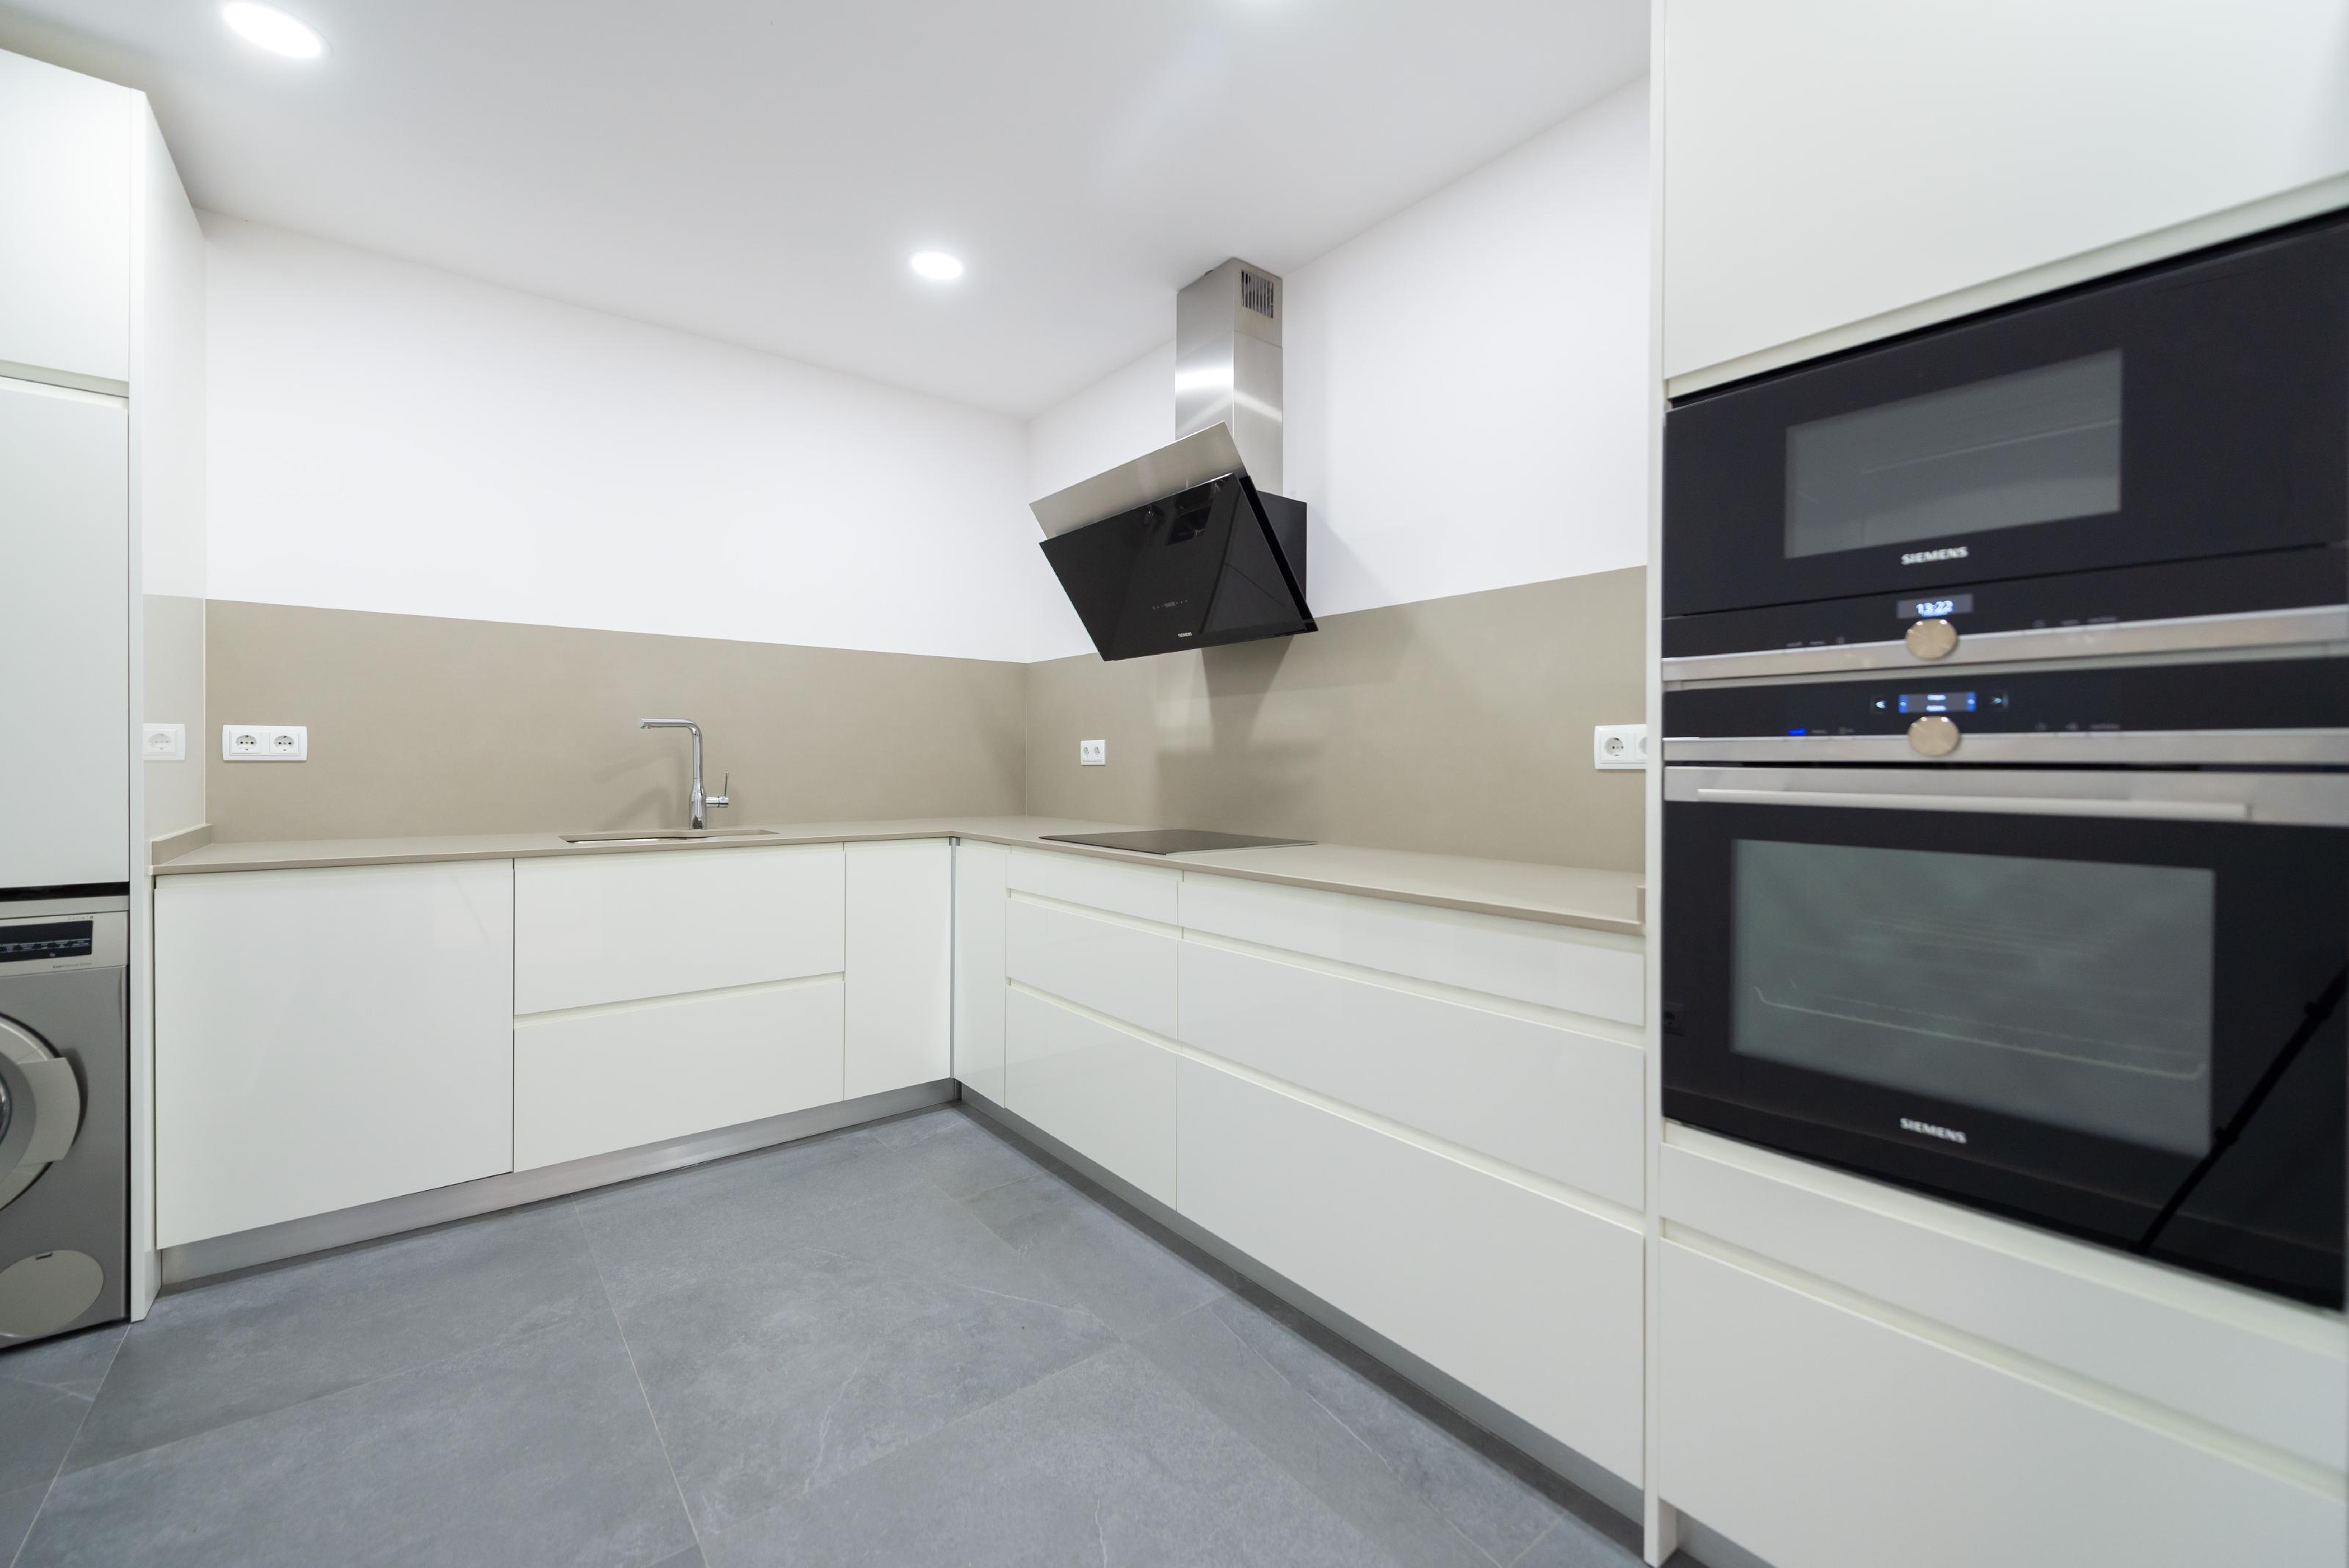 245231 Flat for sale in Sarrià-Sant Gervasi, Sant Gervasi-Galvany 20